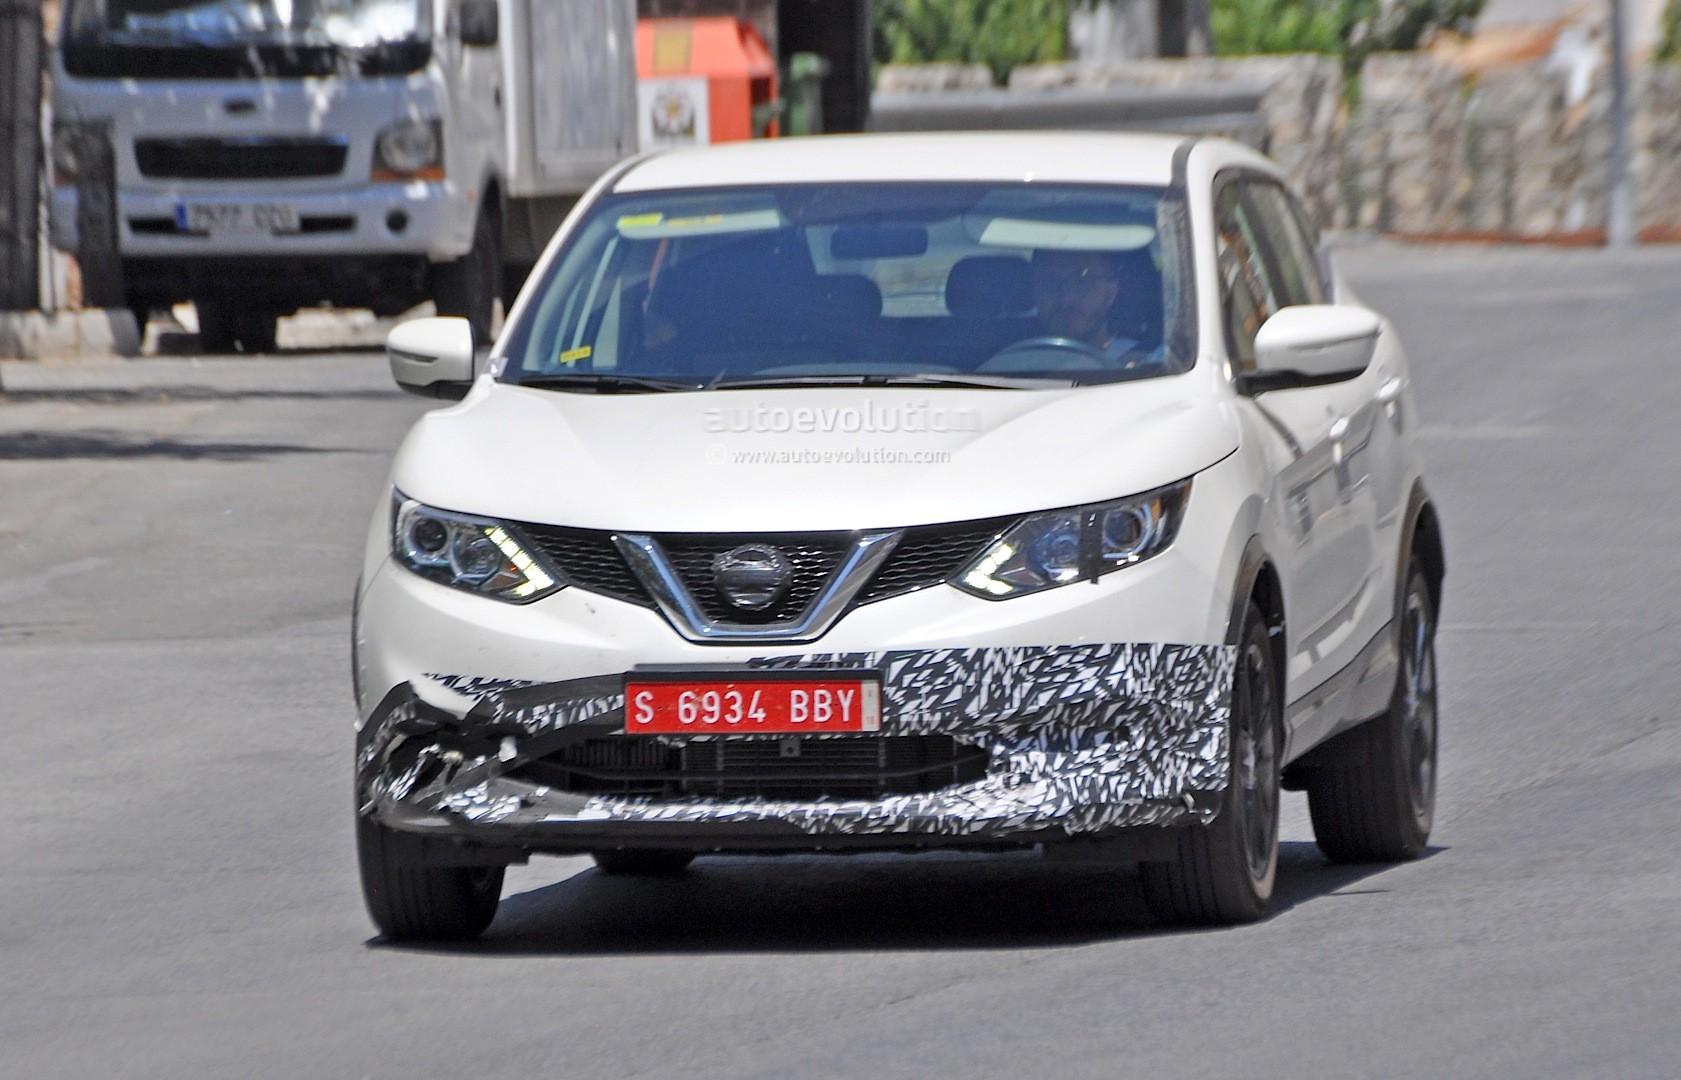 Nissan Qashqai Usa >> Us Spec Nissan Qashqai Spied Testing In Spain With Manlier